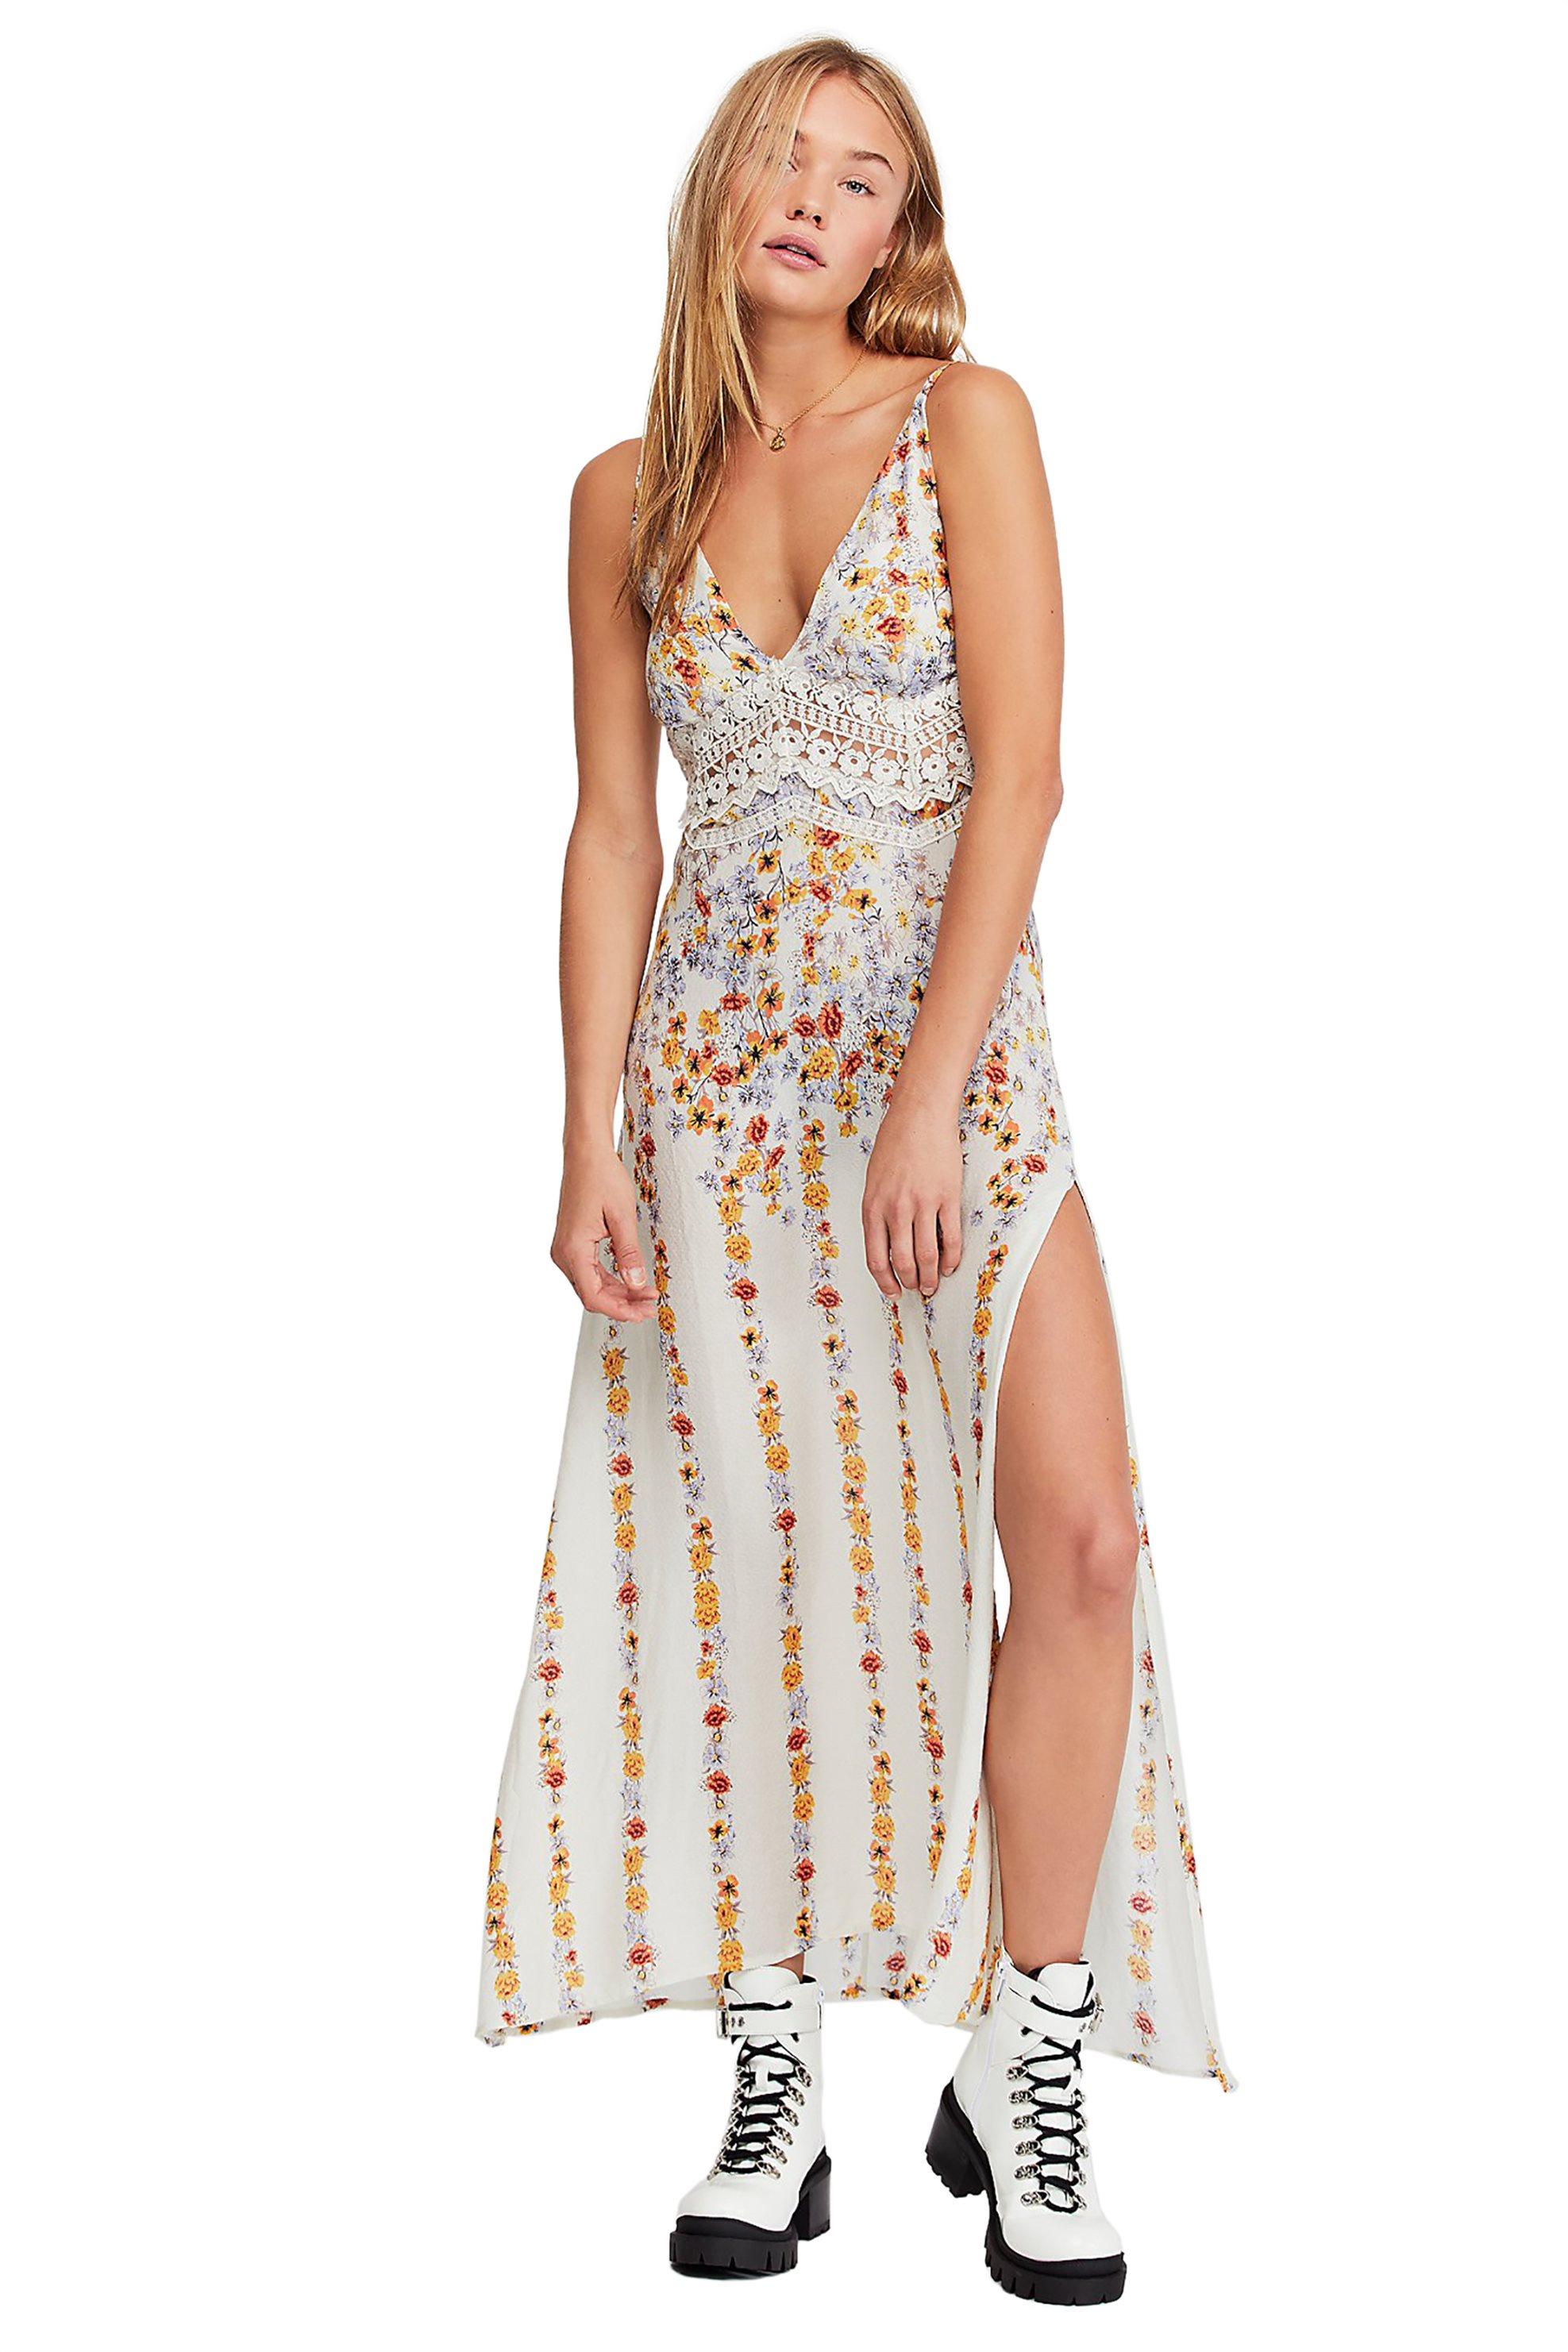 Free People γυναικείο φόρεμα εμπριμέ Claire Printed Maxi Slip - OB922530 - Λευκό γυναικα   ρουχα   φορέματα   maxi φορέματα